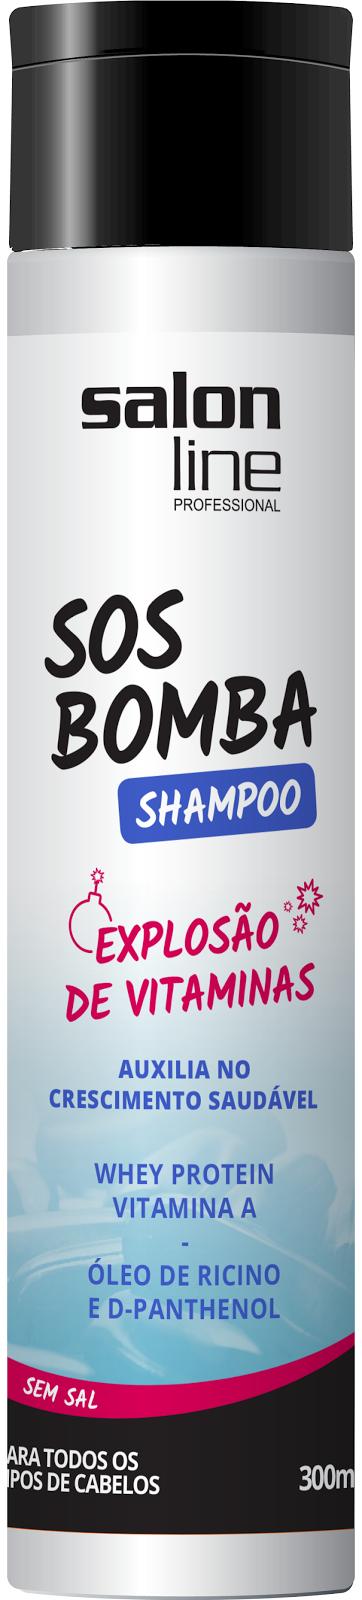 Salon line lan a linha para cabelos cacheados na beauty for Salon line bomba